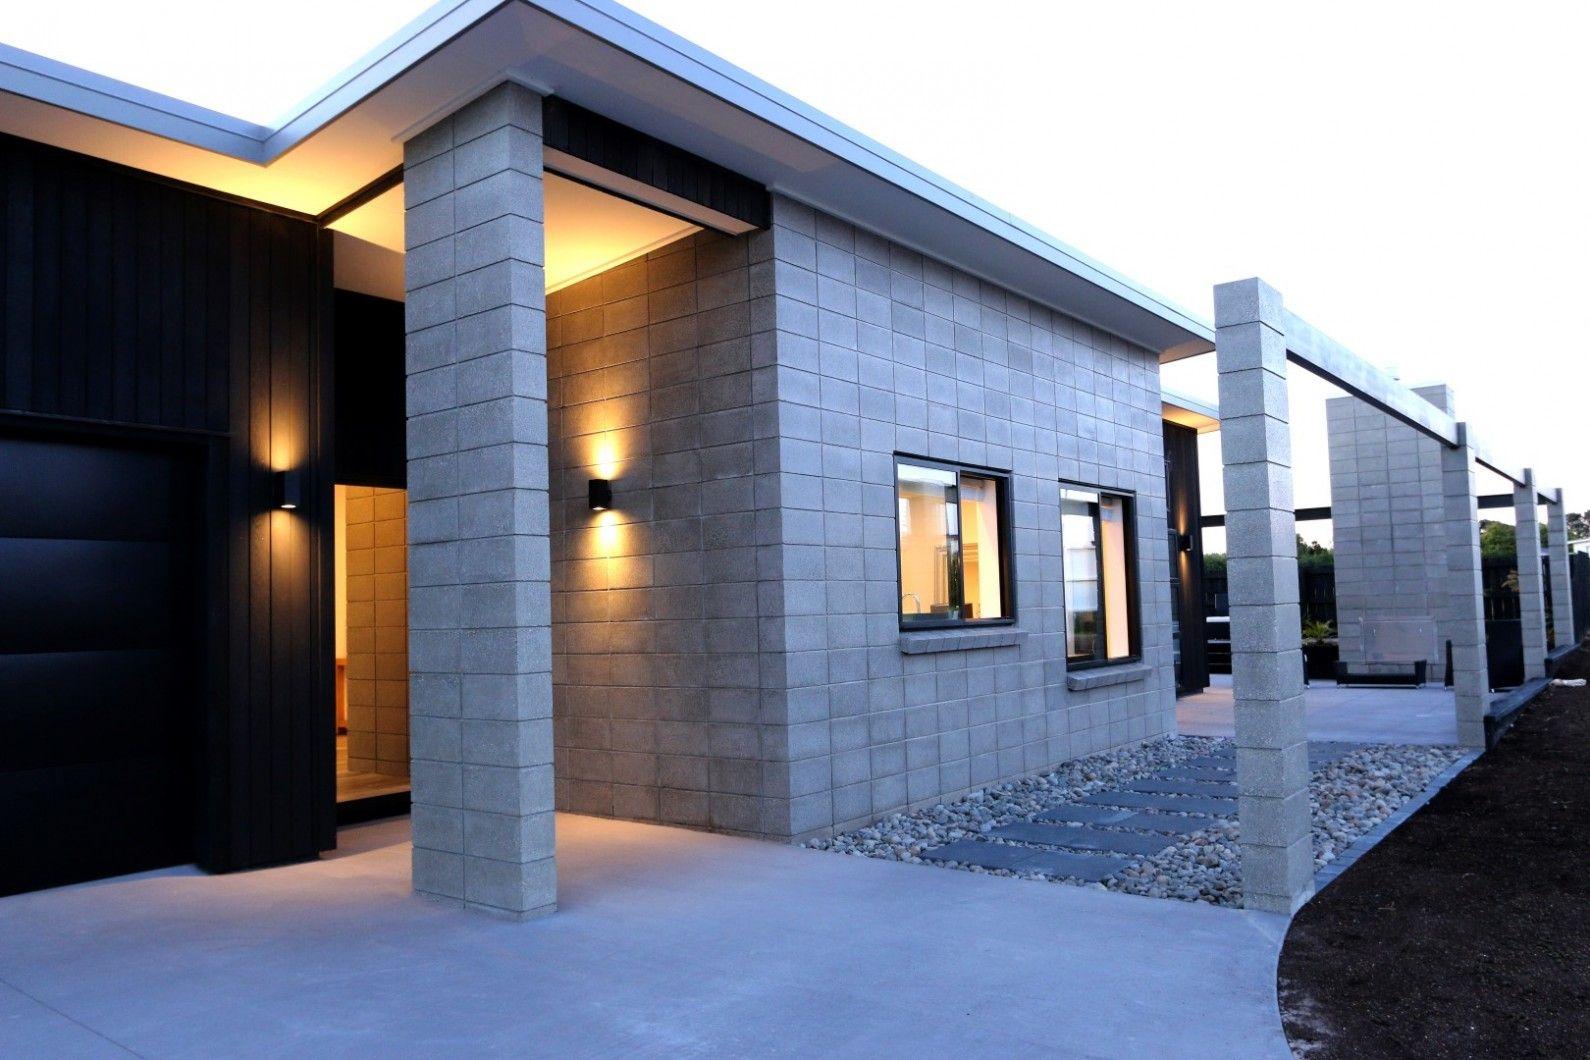 Exterior Block Cladding Nz Google Search Brick Exterior House Concrete Cladding Modern House Exterior